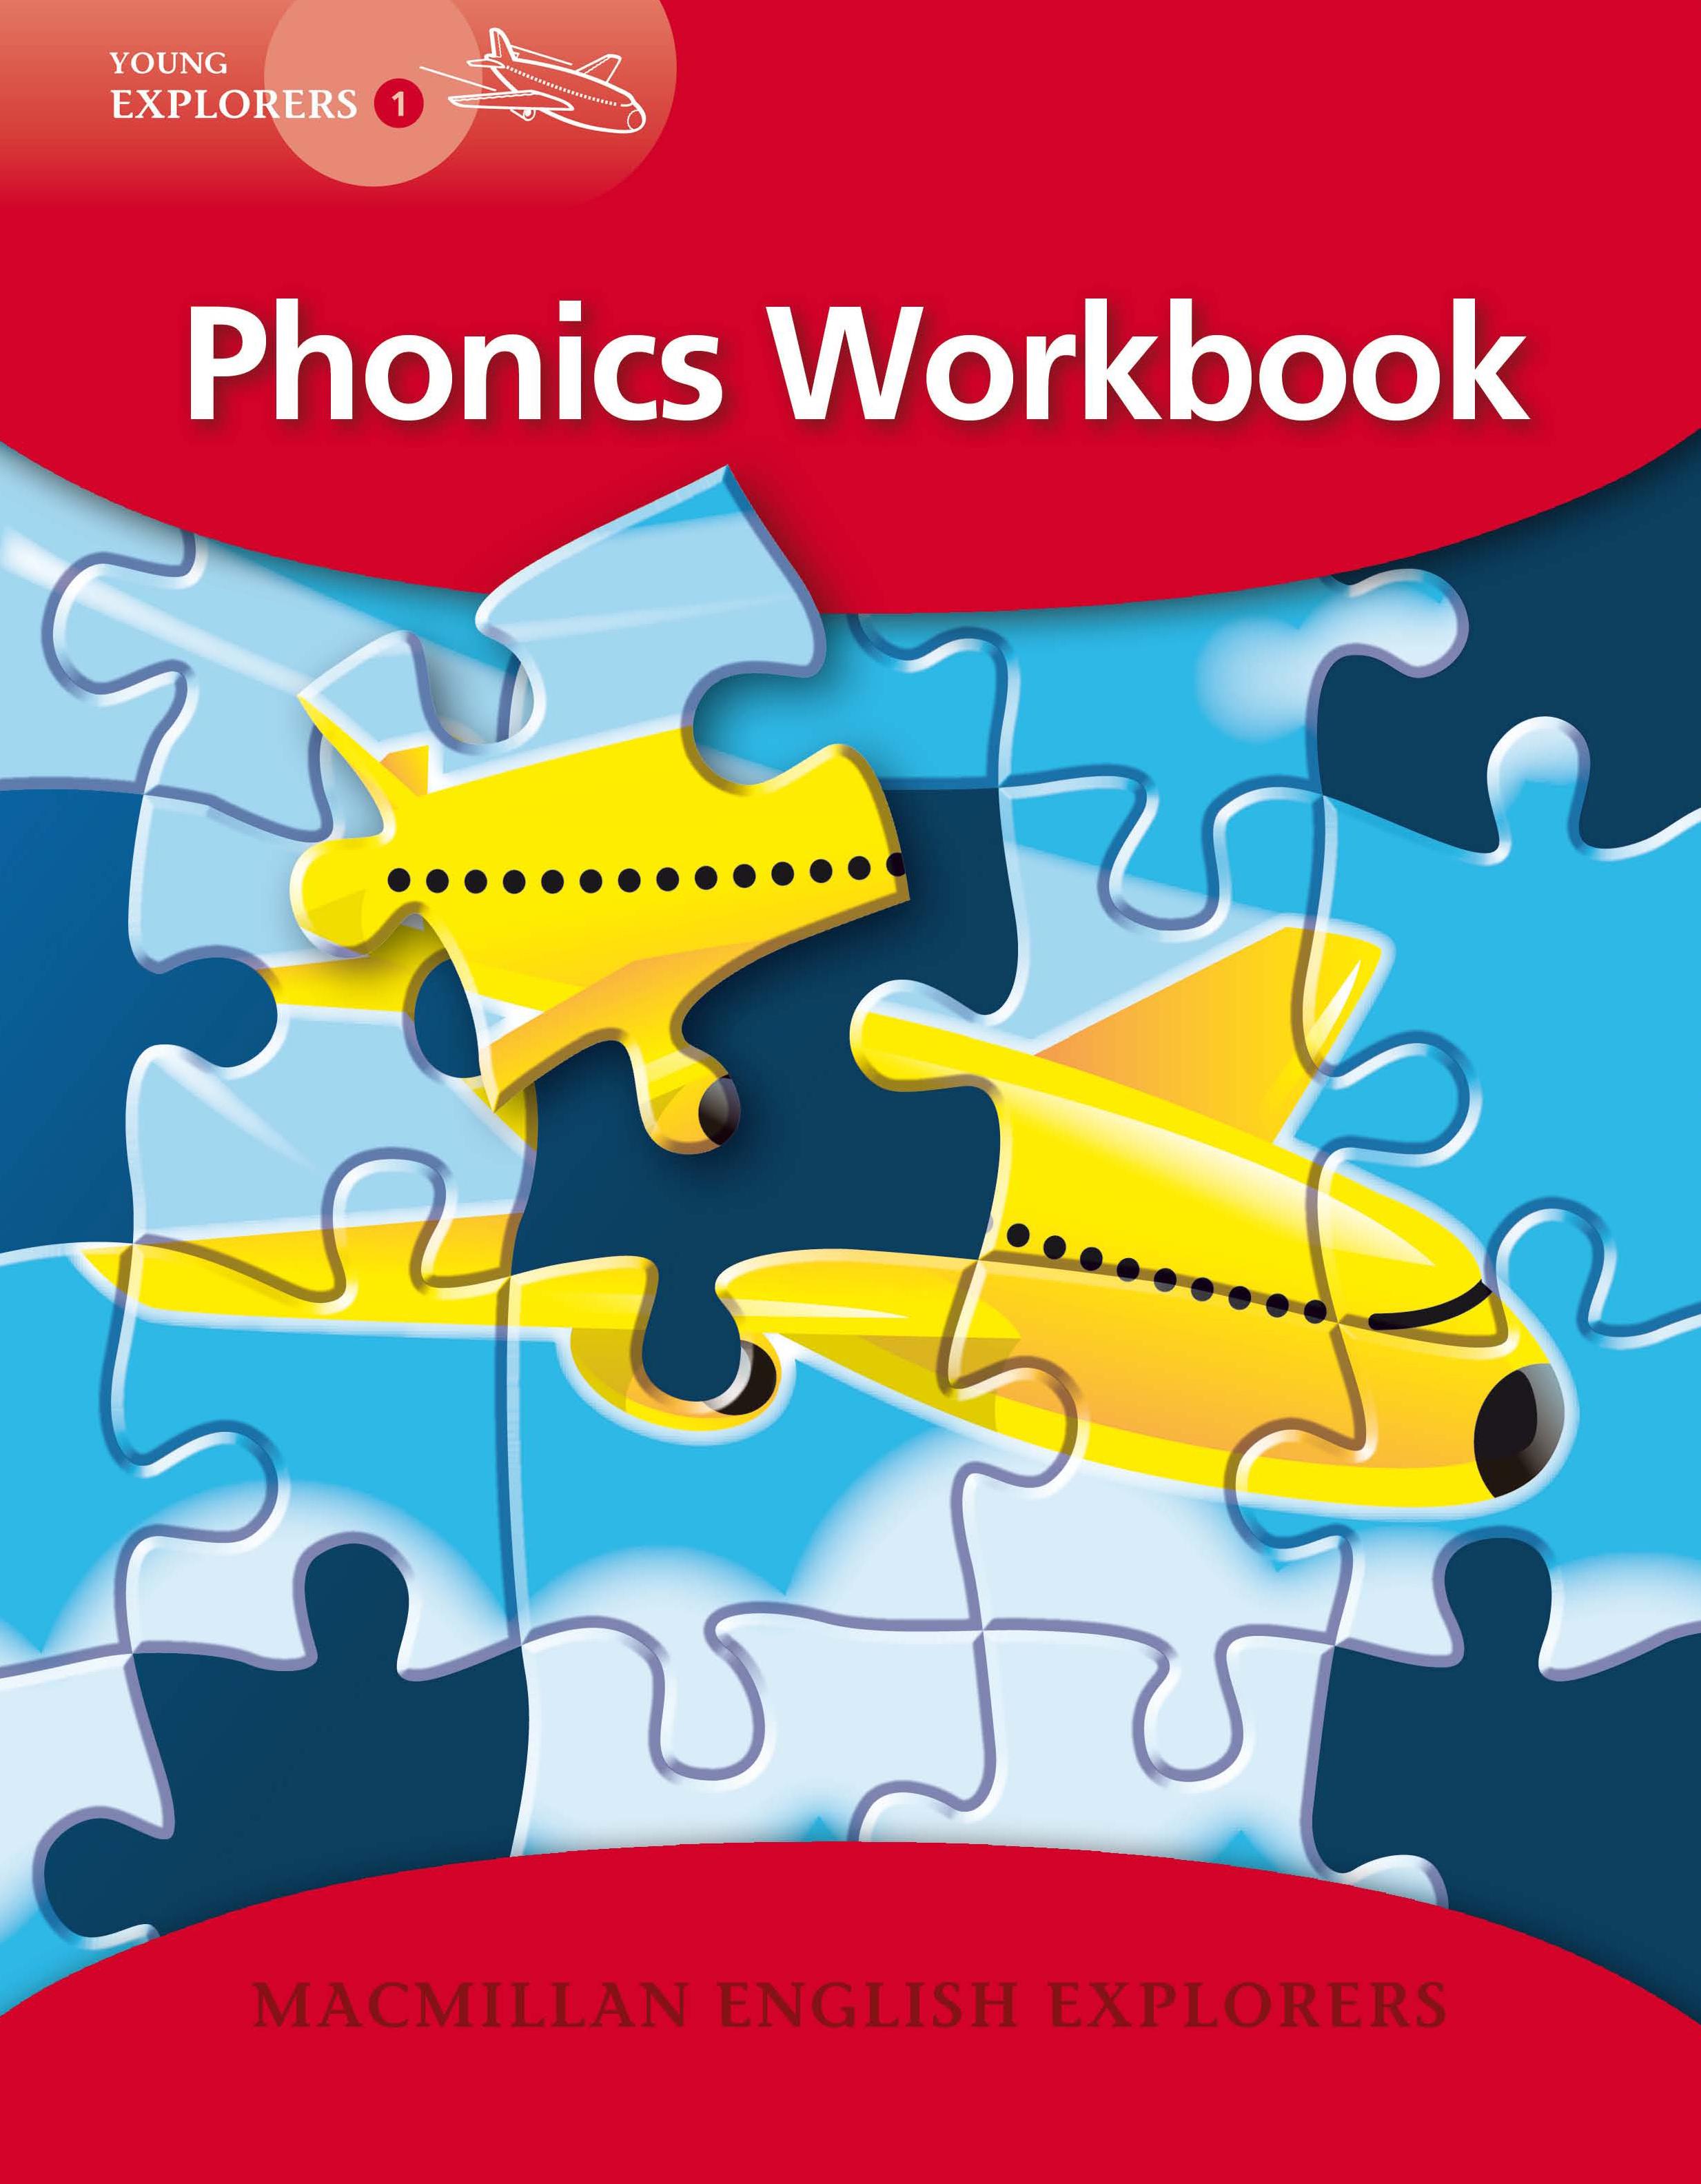 Young Explorers 1: Phonics Workbook